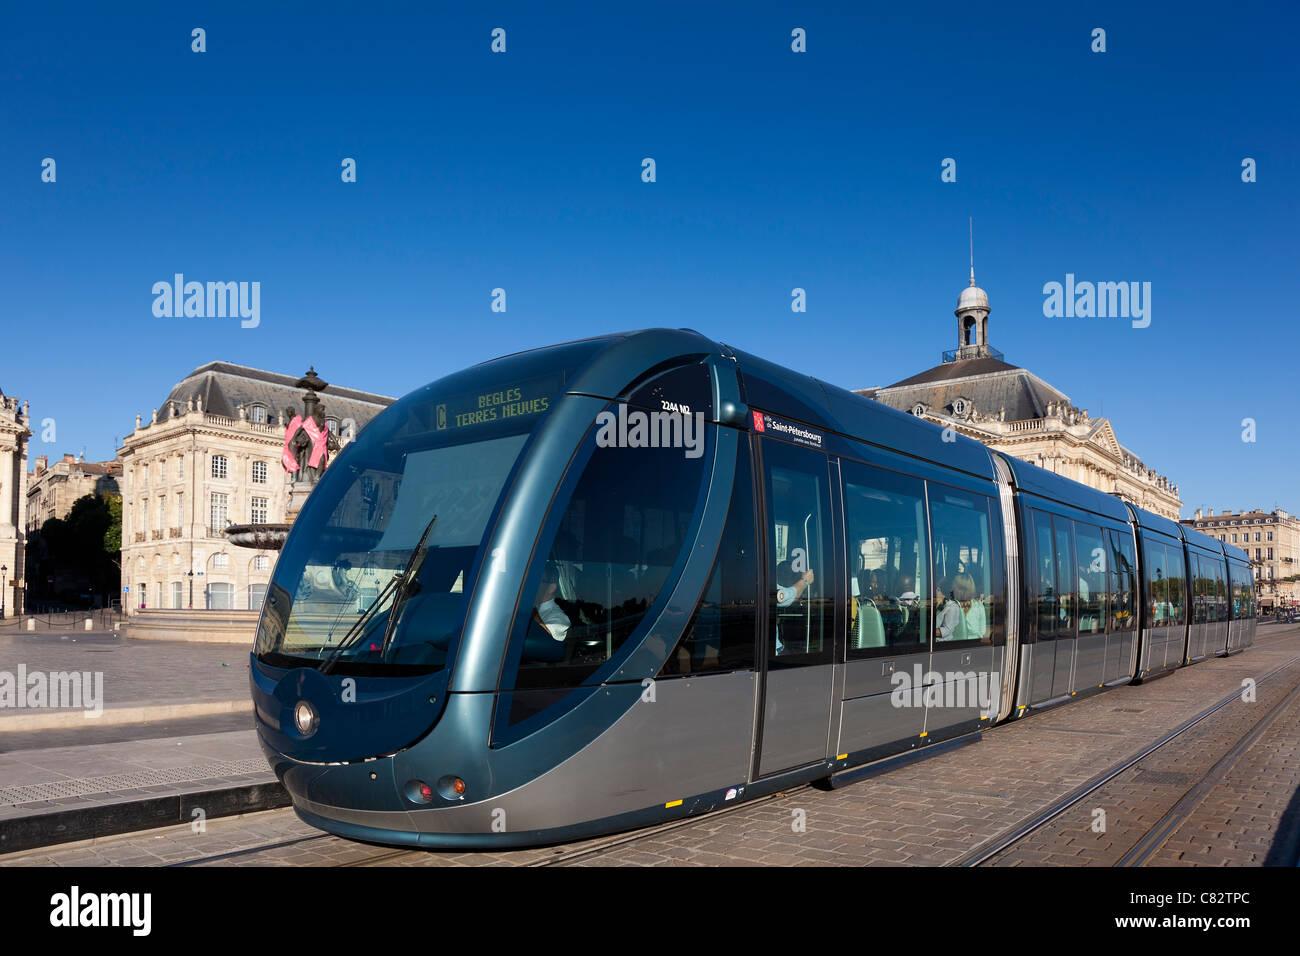 Streetcar of Bordeaux, Aquitaine, France - Stock Image